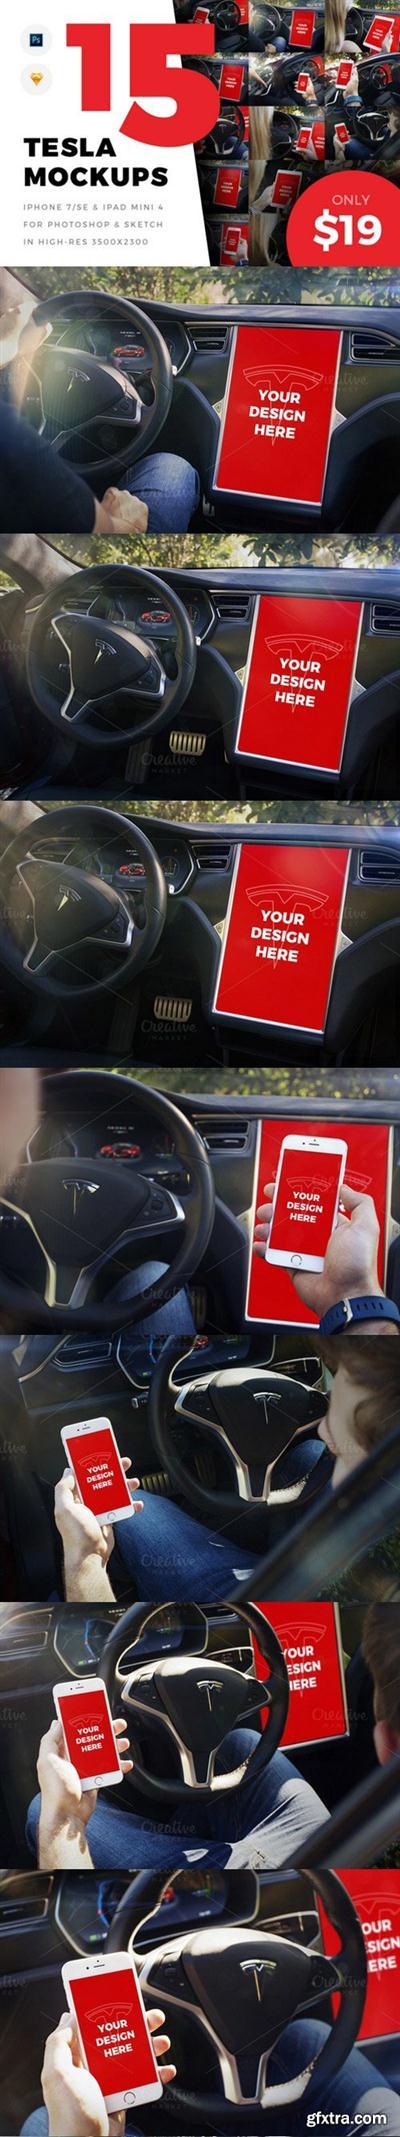 CM - 15 Tesla Mockups (iPhone 7SE, iPad) 966935